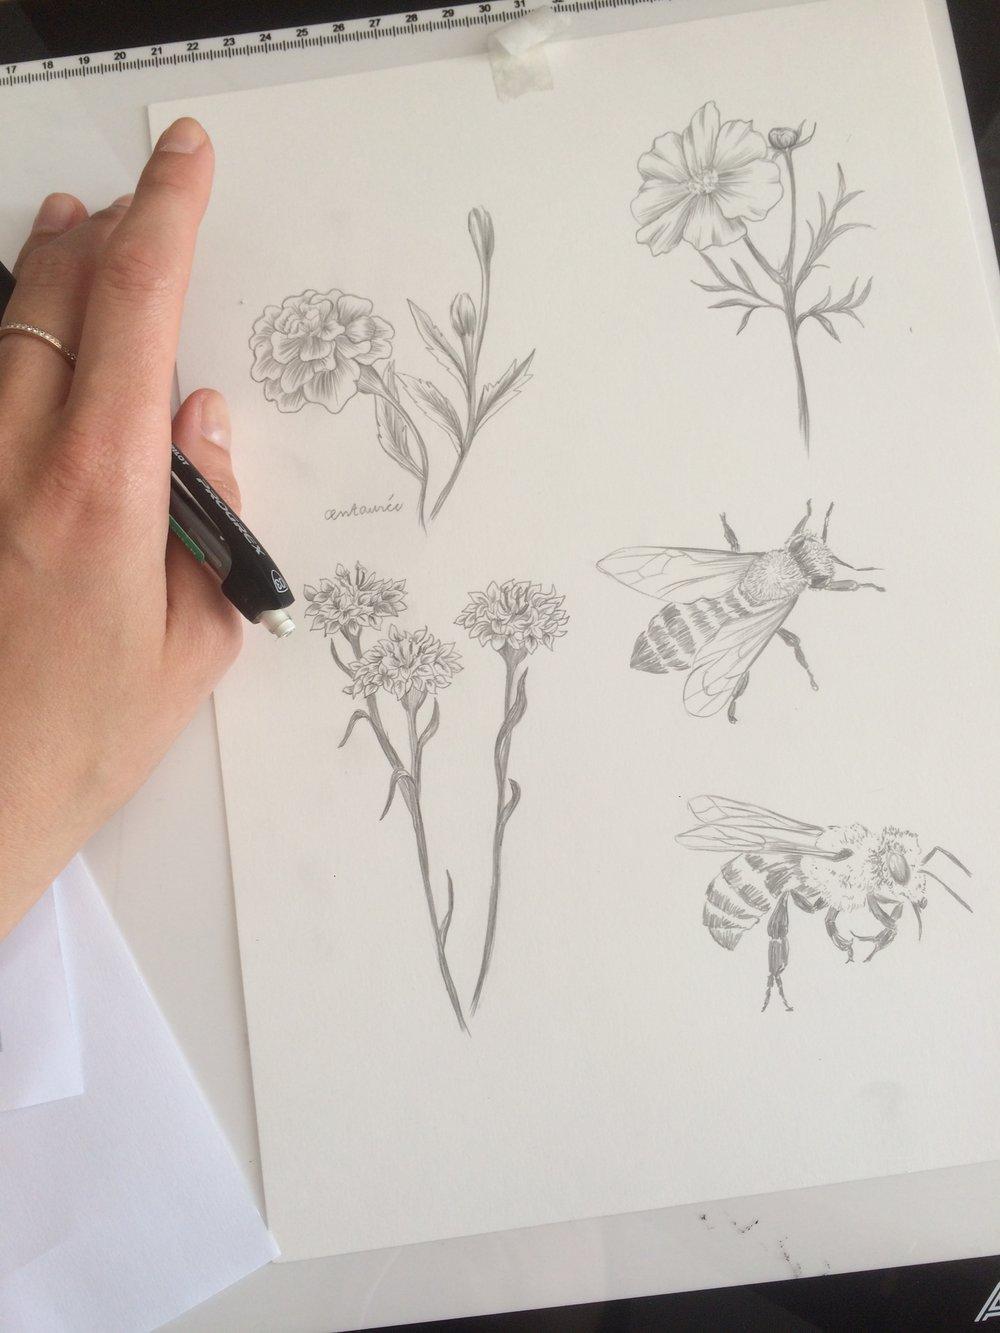 Marie-de-Beaucourt-illustration-editorial-Regain-ete2018-wip4.JPG